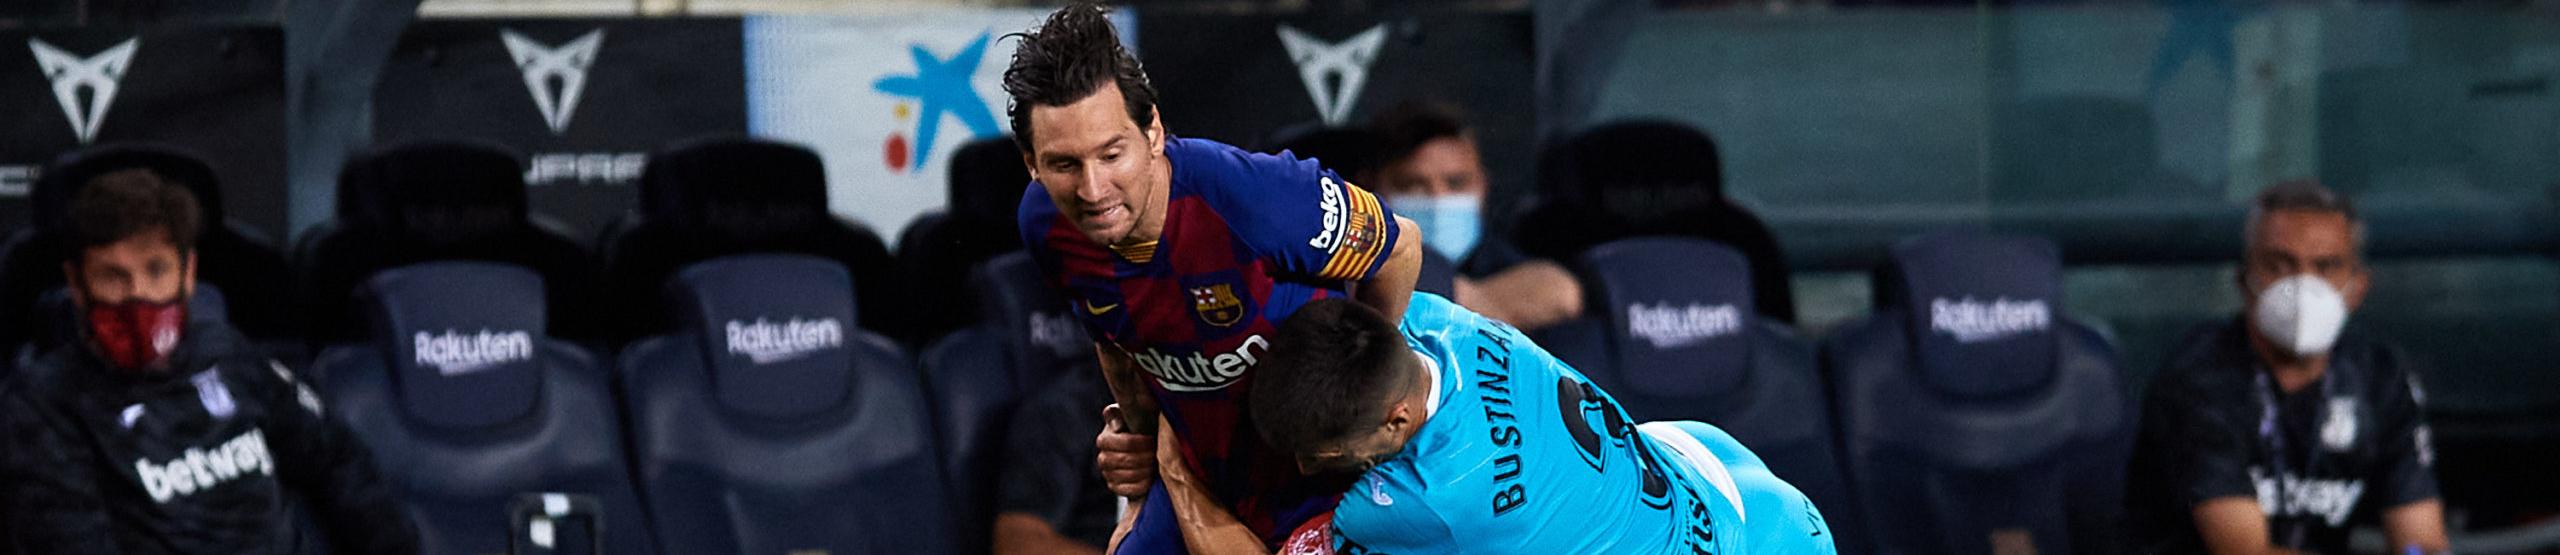 Pronostici Liga, tutte le partite di oggi 19 giugno: chi fermerà Messi?